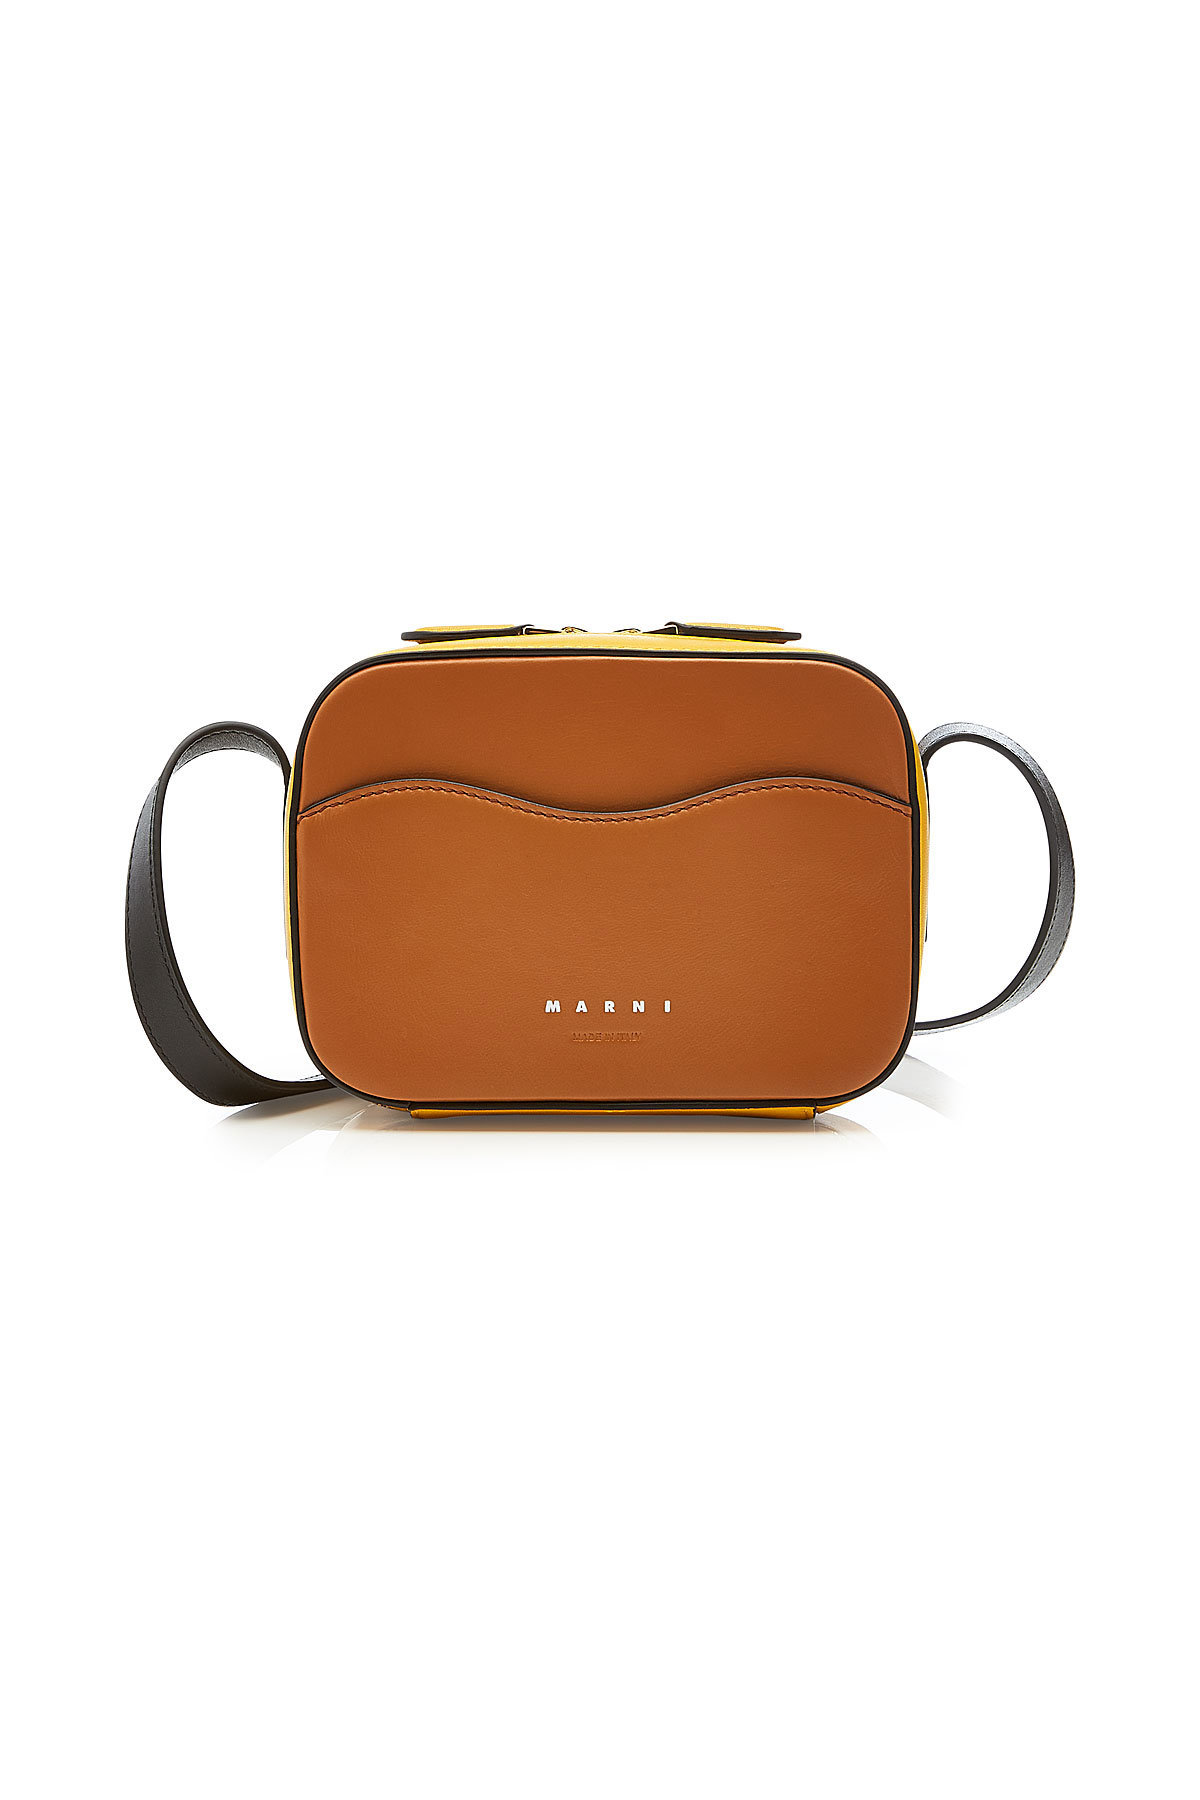 Shell Crossbody Leather Bag | MARNI